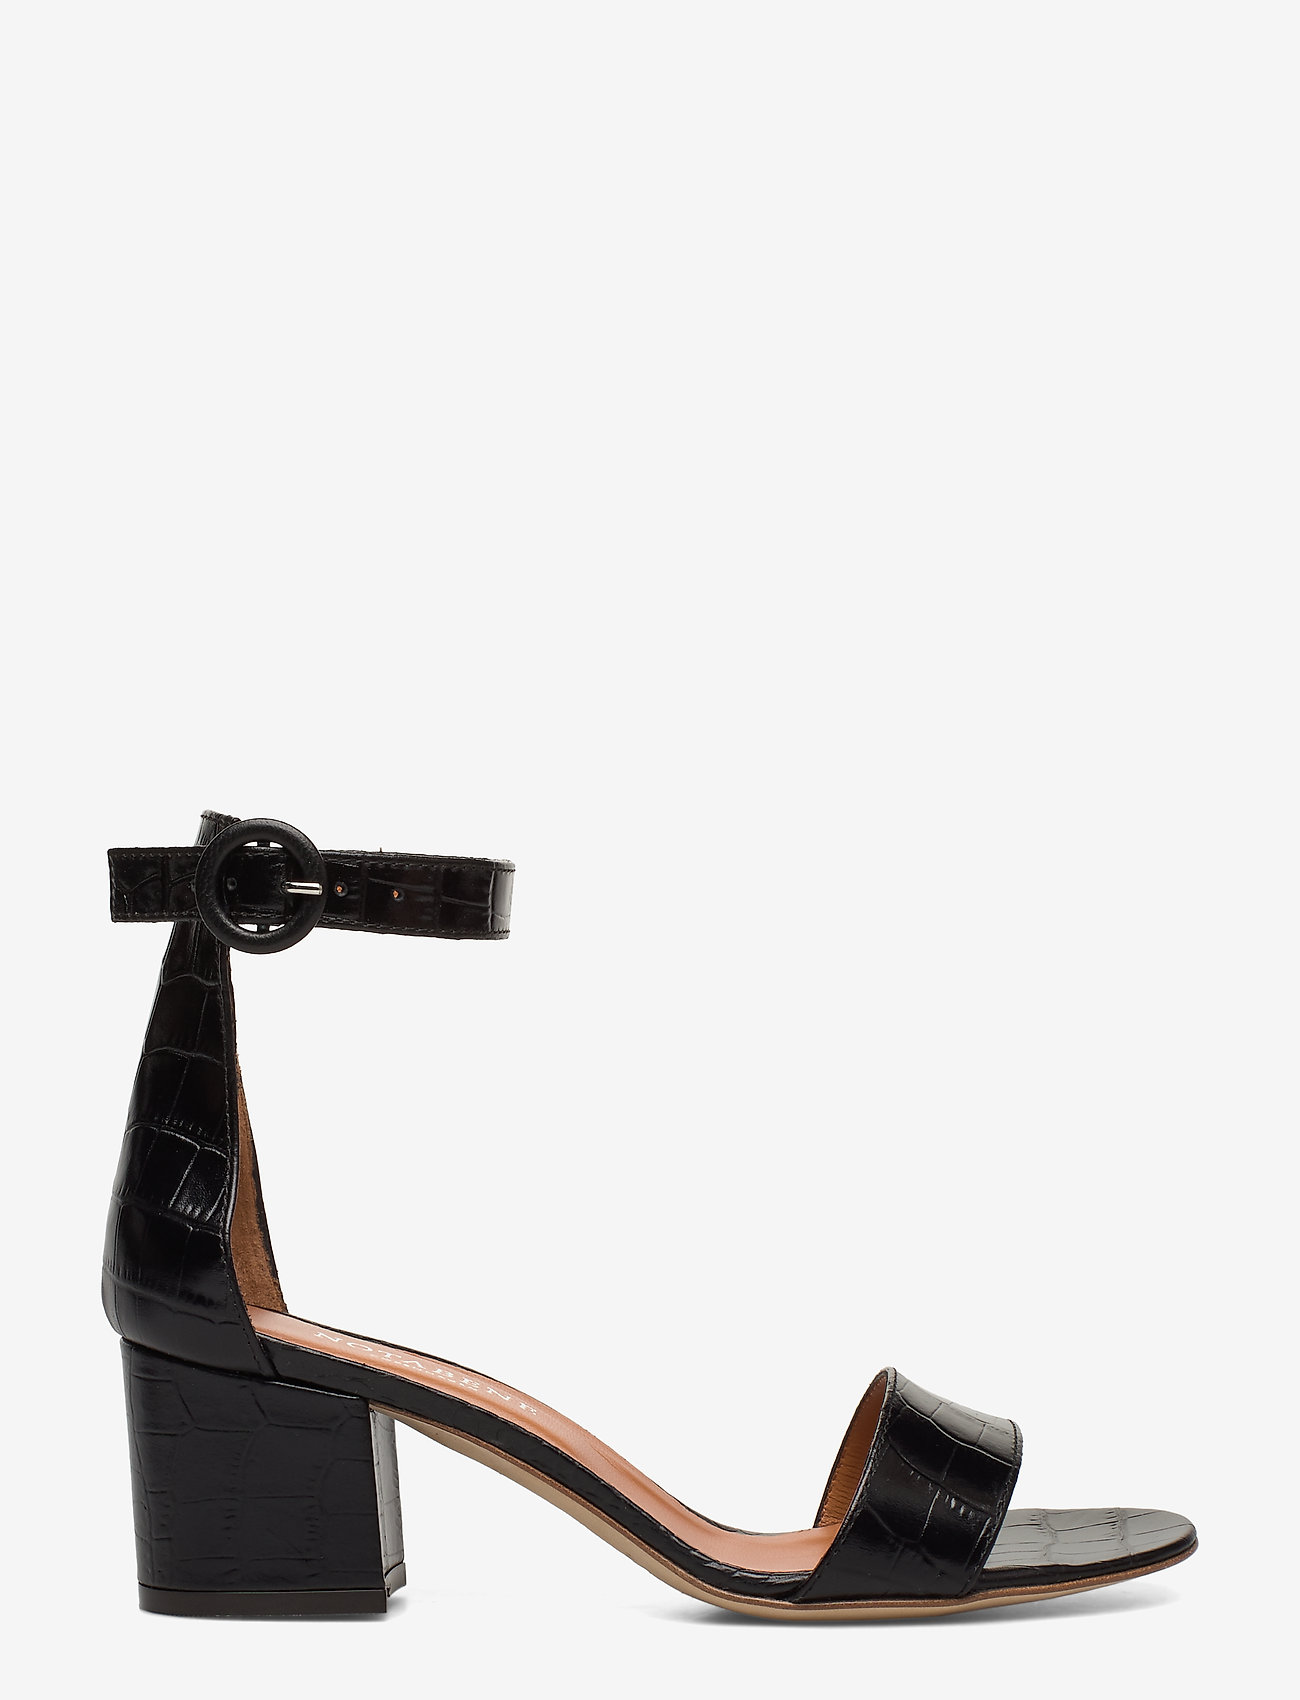 NOTABENE - Lia - høyhælte sandaler - black croco leather - 1